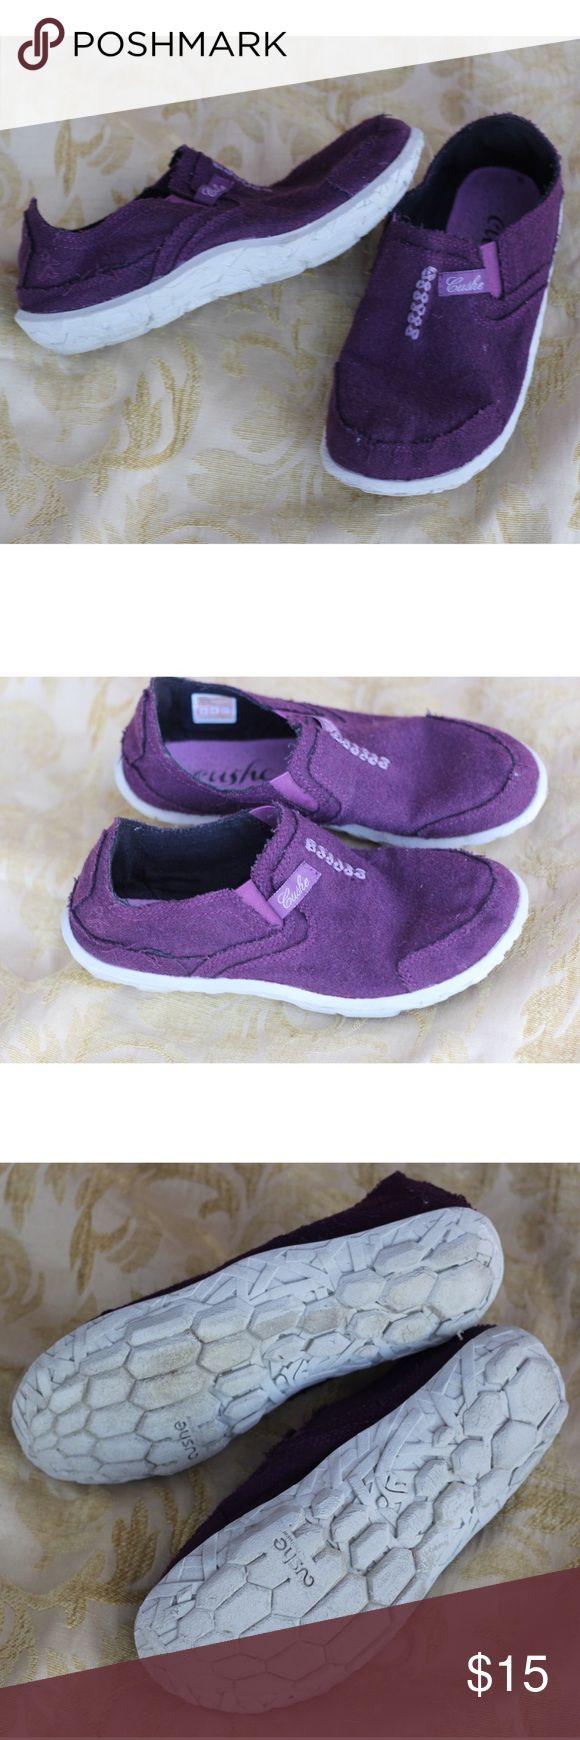 Cushe Slipper II Purple Felt Shoes 37/6 Cushe Slipper II Shoes, 37/6. Purple Felt. Inner sole has some pilling. Lightweight and comfy. Nice overall condition and smoke free home. Thanks!! Cushe Shoes